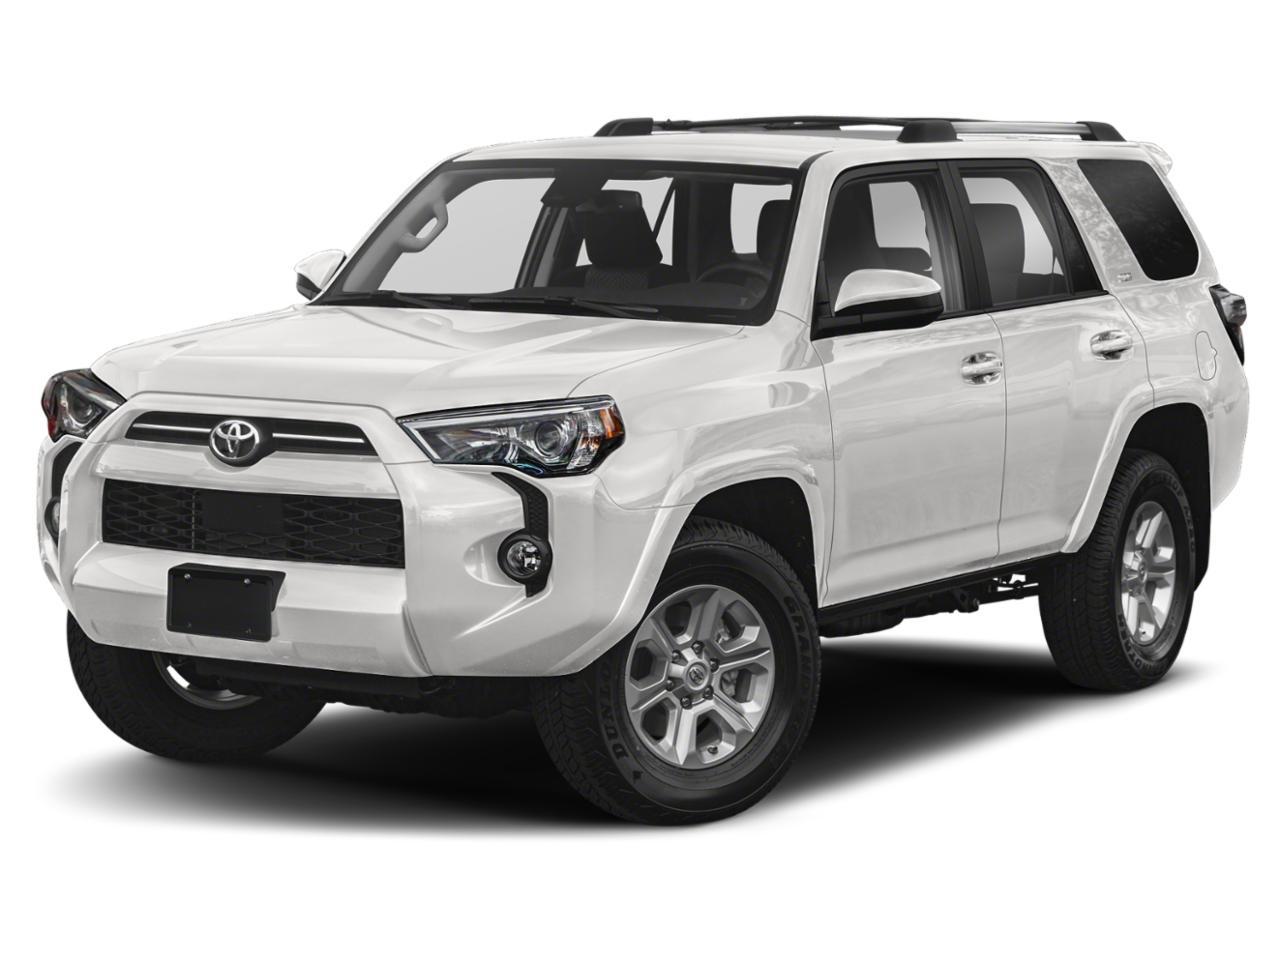 2020 Toyota 4Runner Vehicle Photo in San Antonio, TX 78238